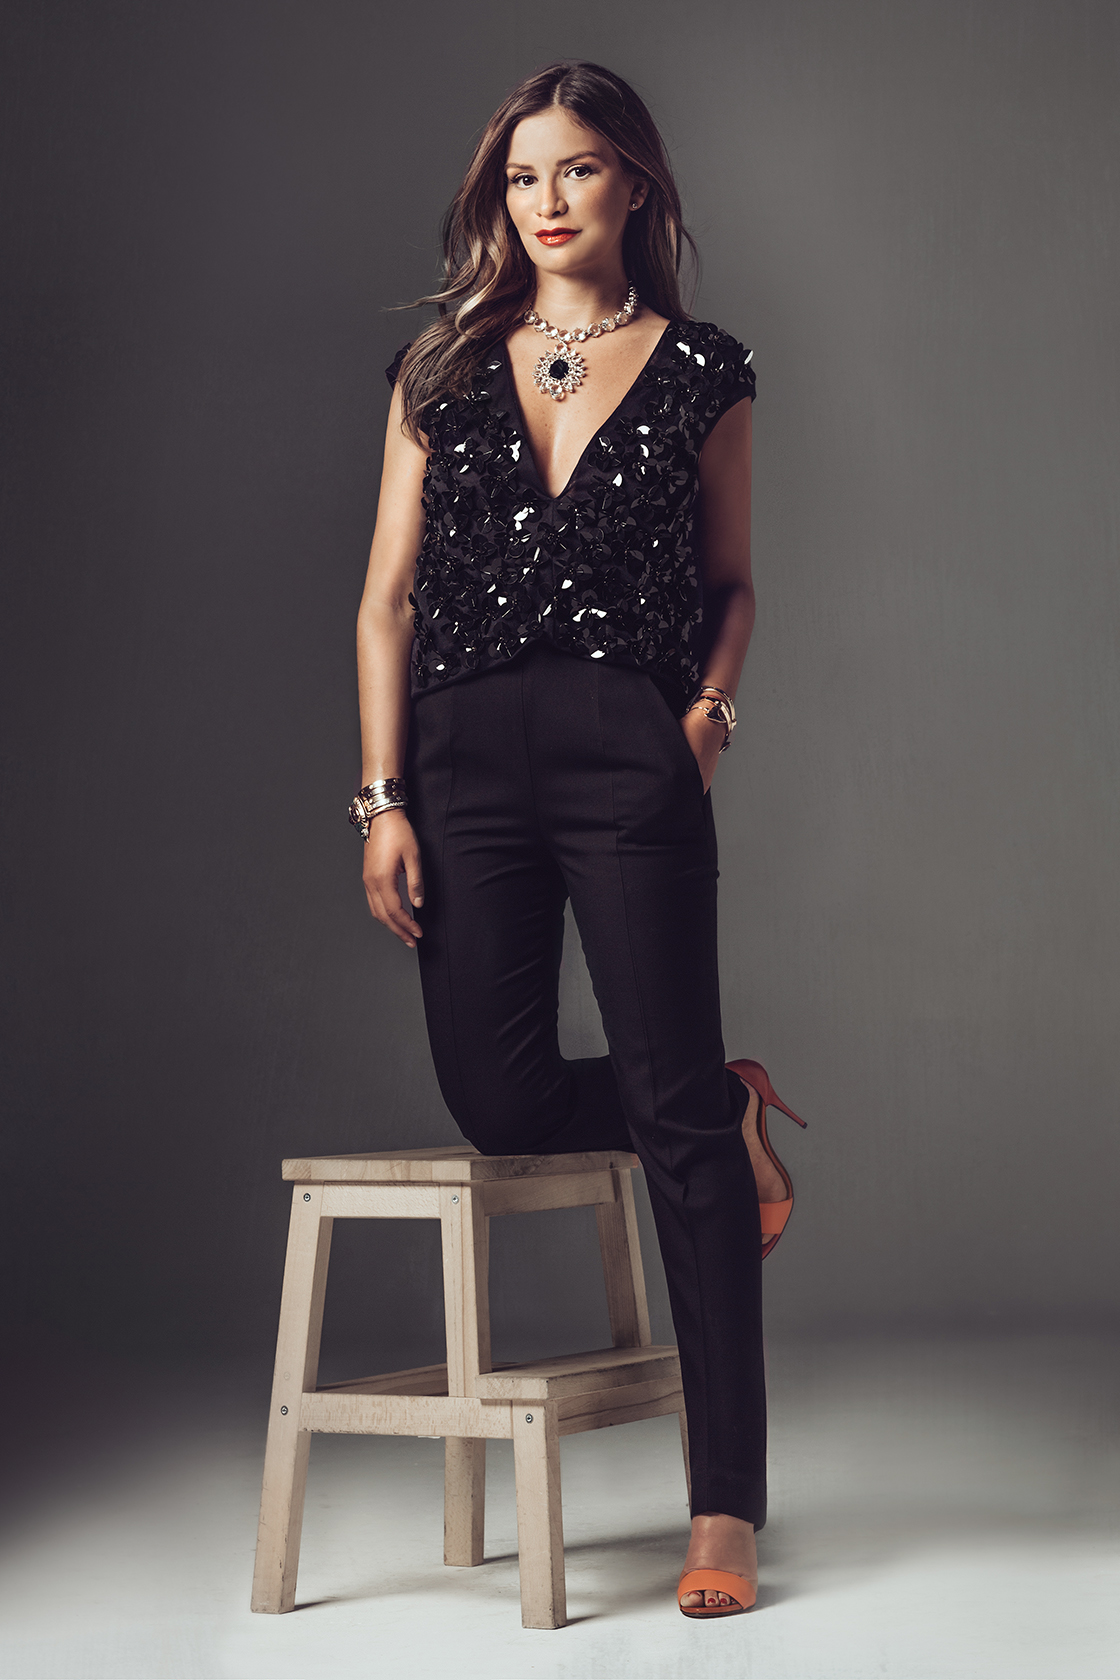 Luisa Fernanda E. for El Universal MX